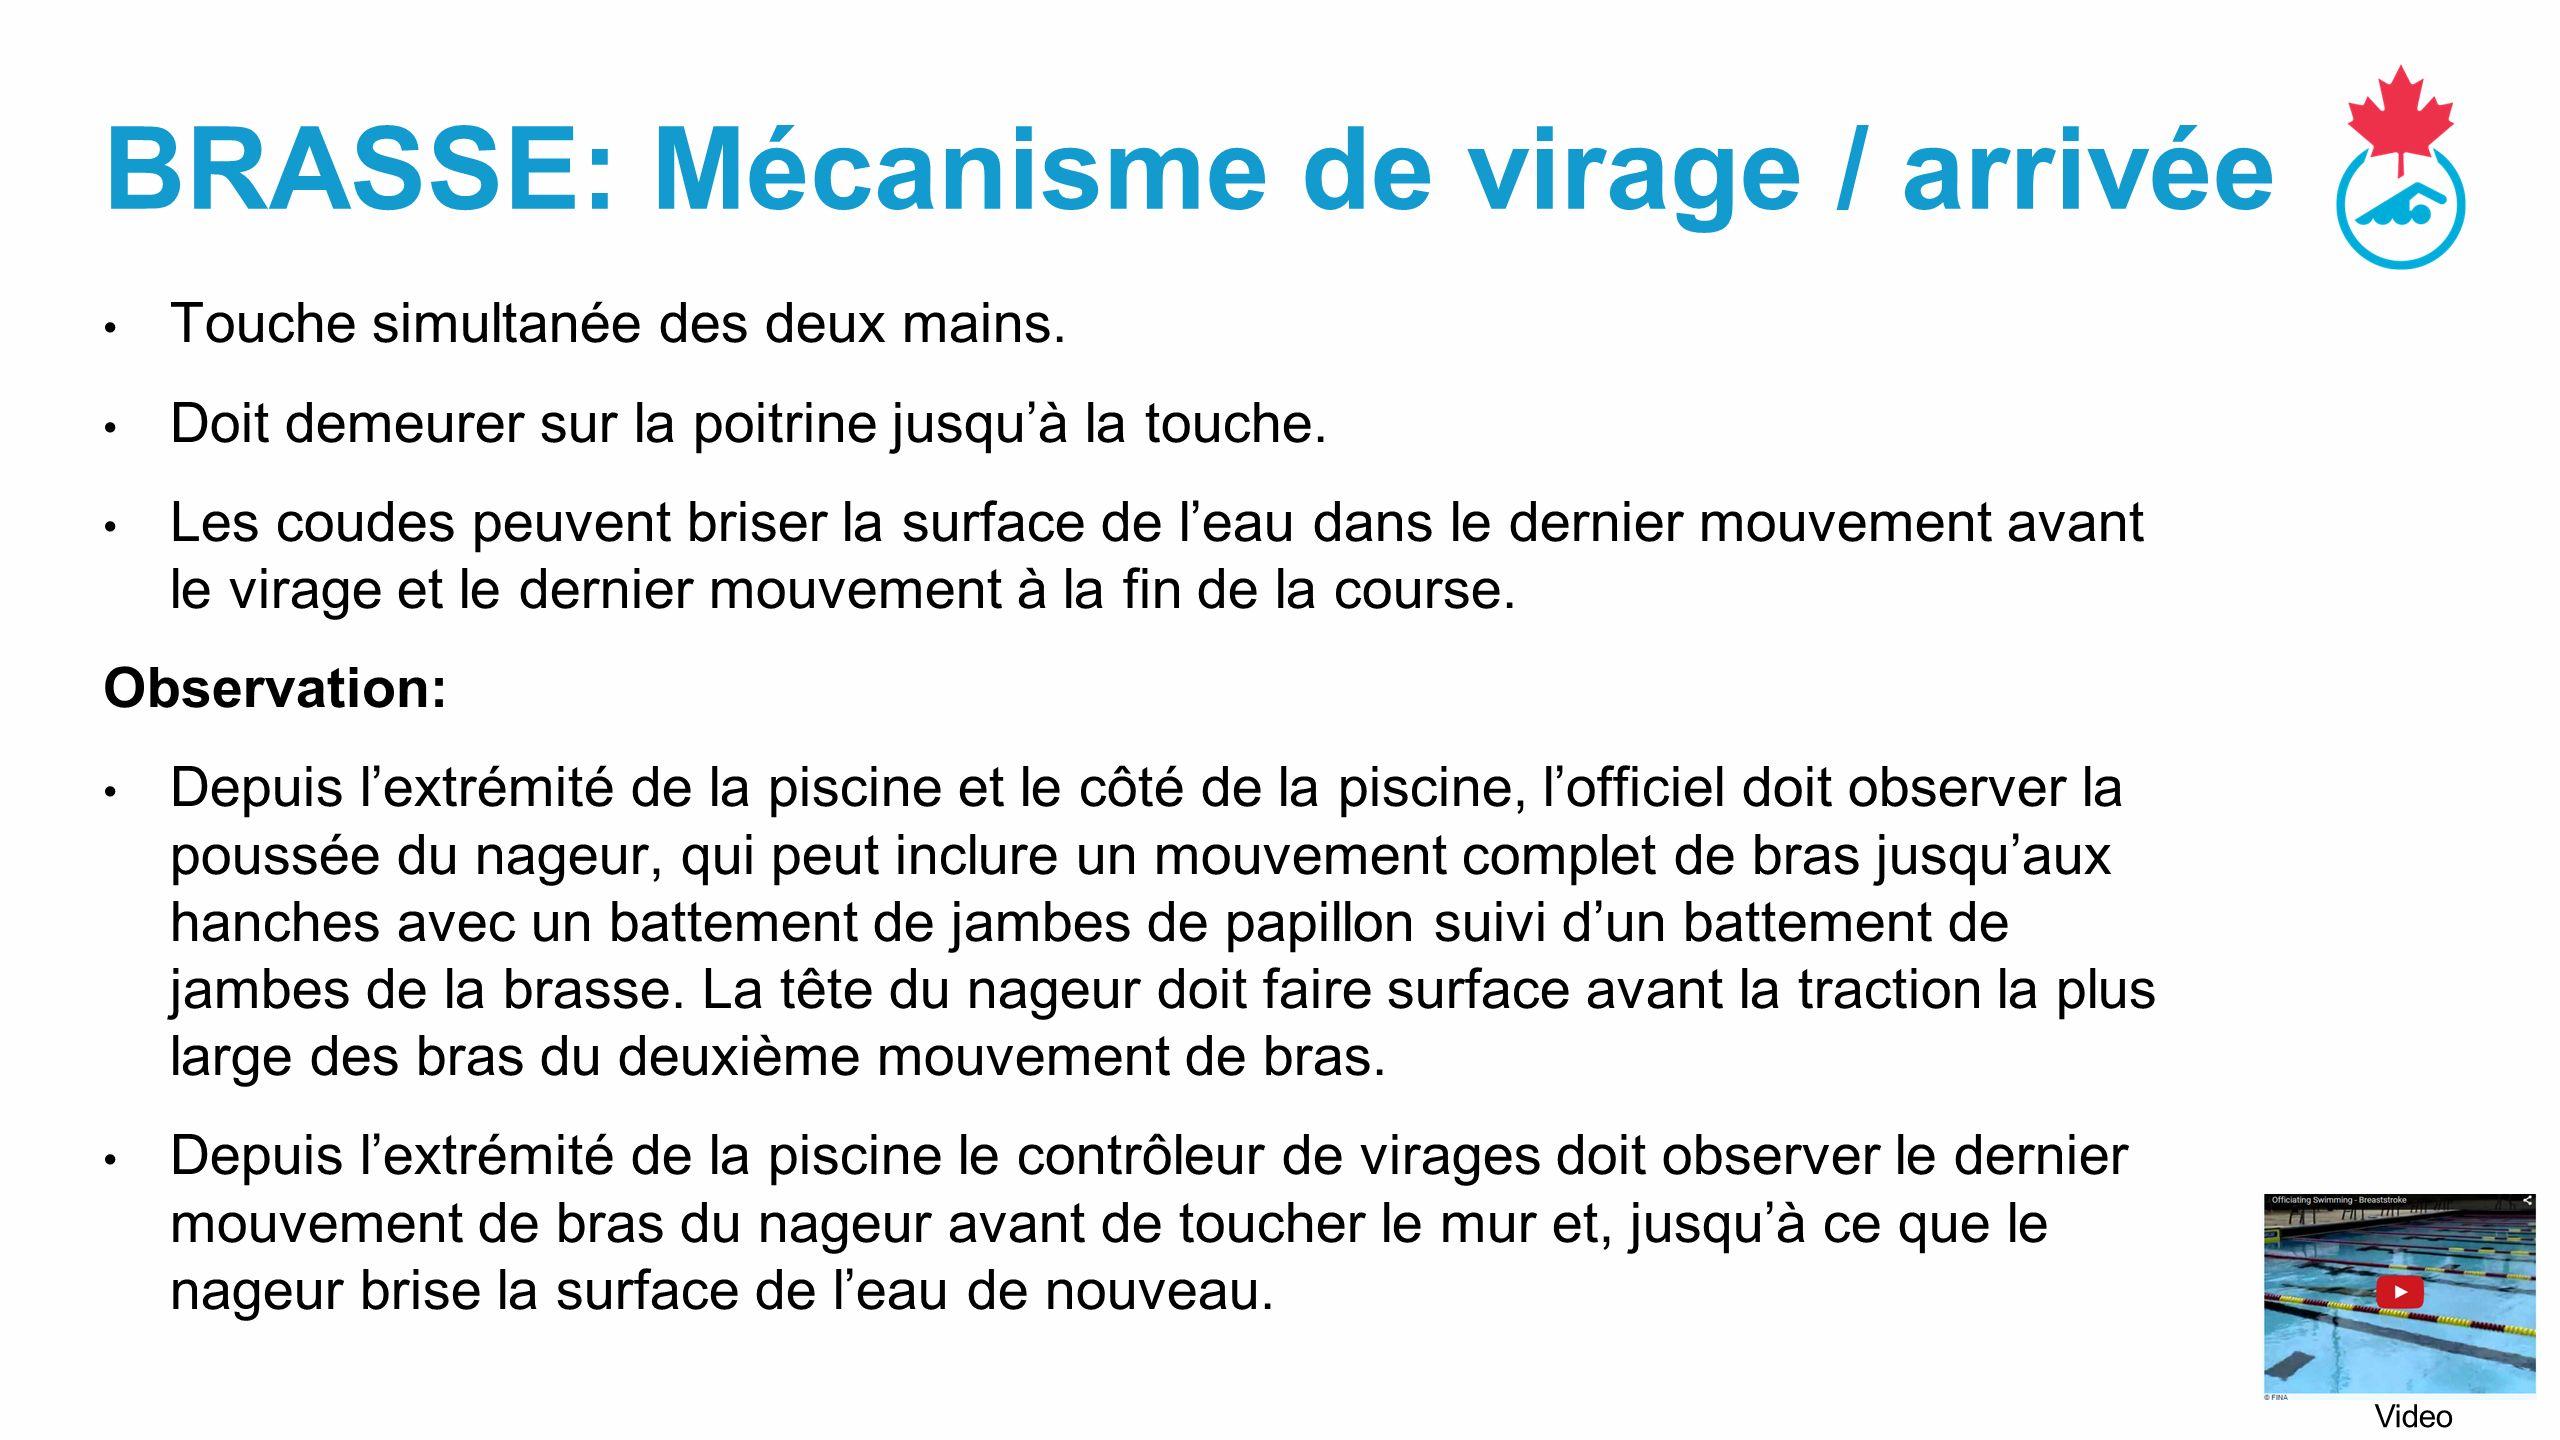 Brasse: Mécanisme de virage / arrivée